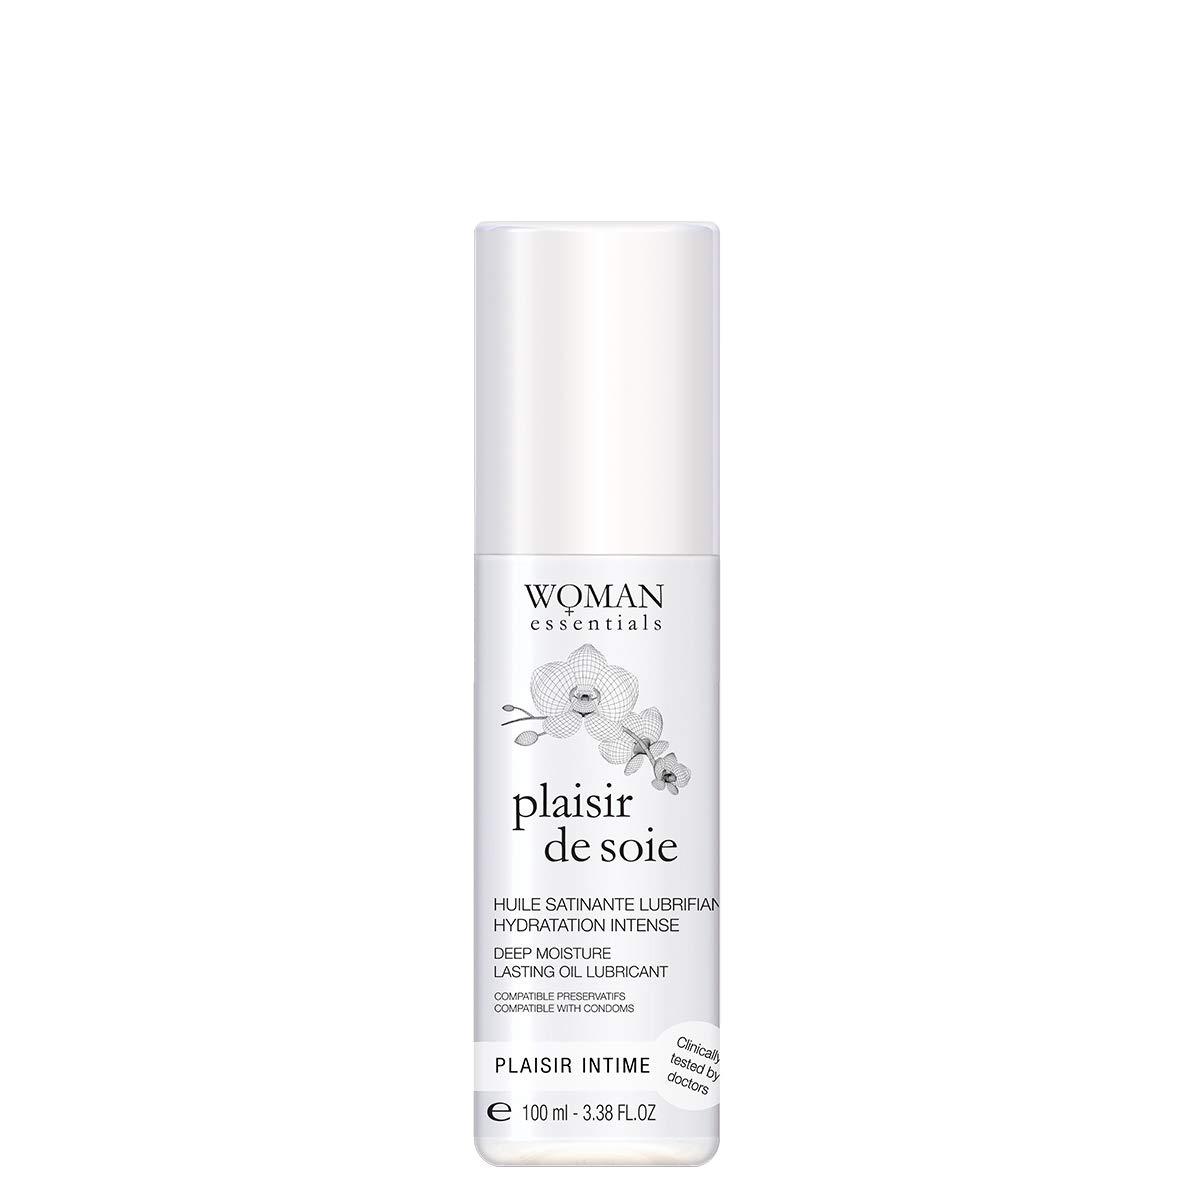 Woman Essentials - PLAISIR DE SOIE - Deep Moisture Lasting Massage Oil and Intimate Lubricant (100ml)